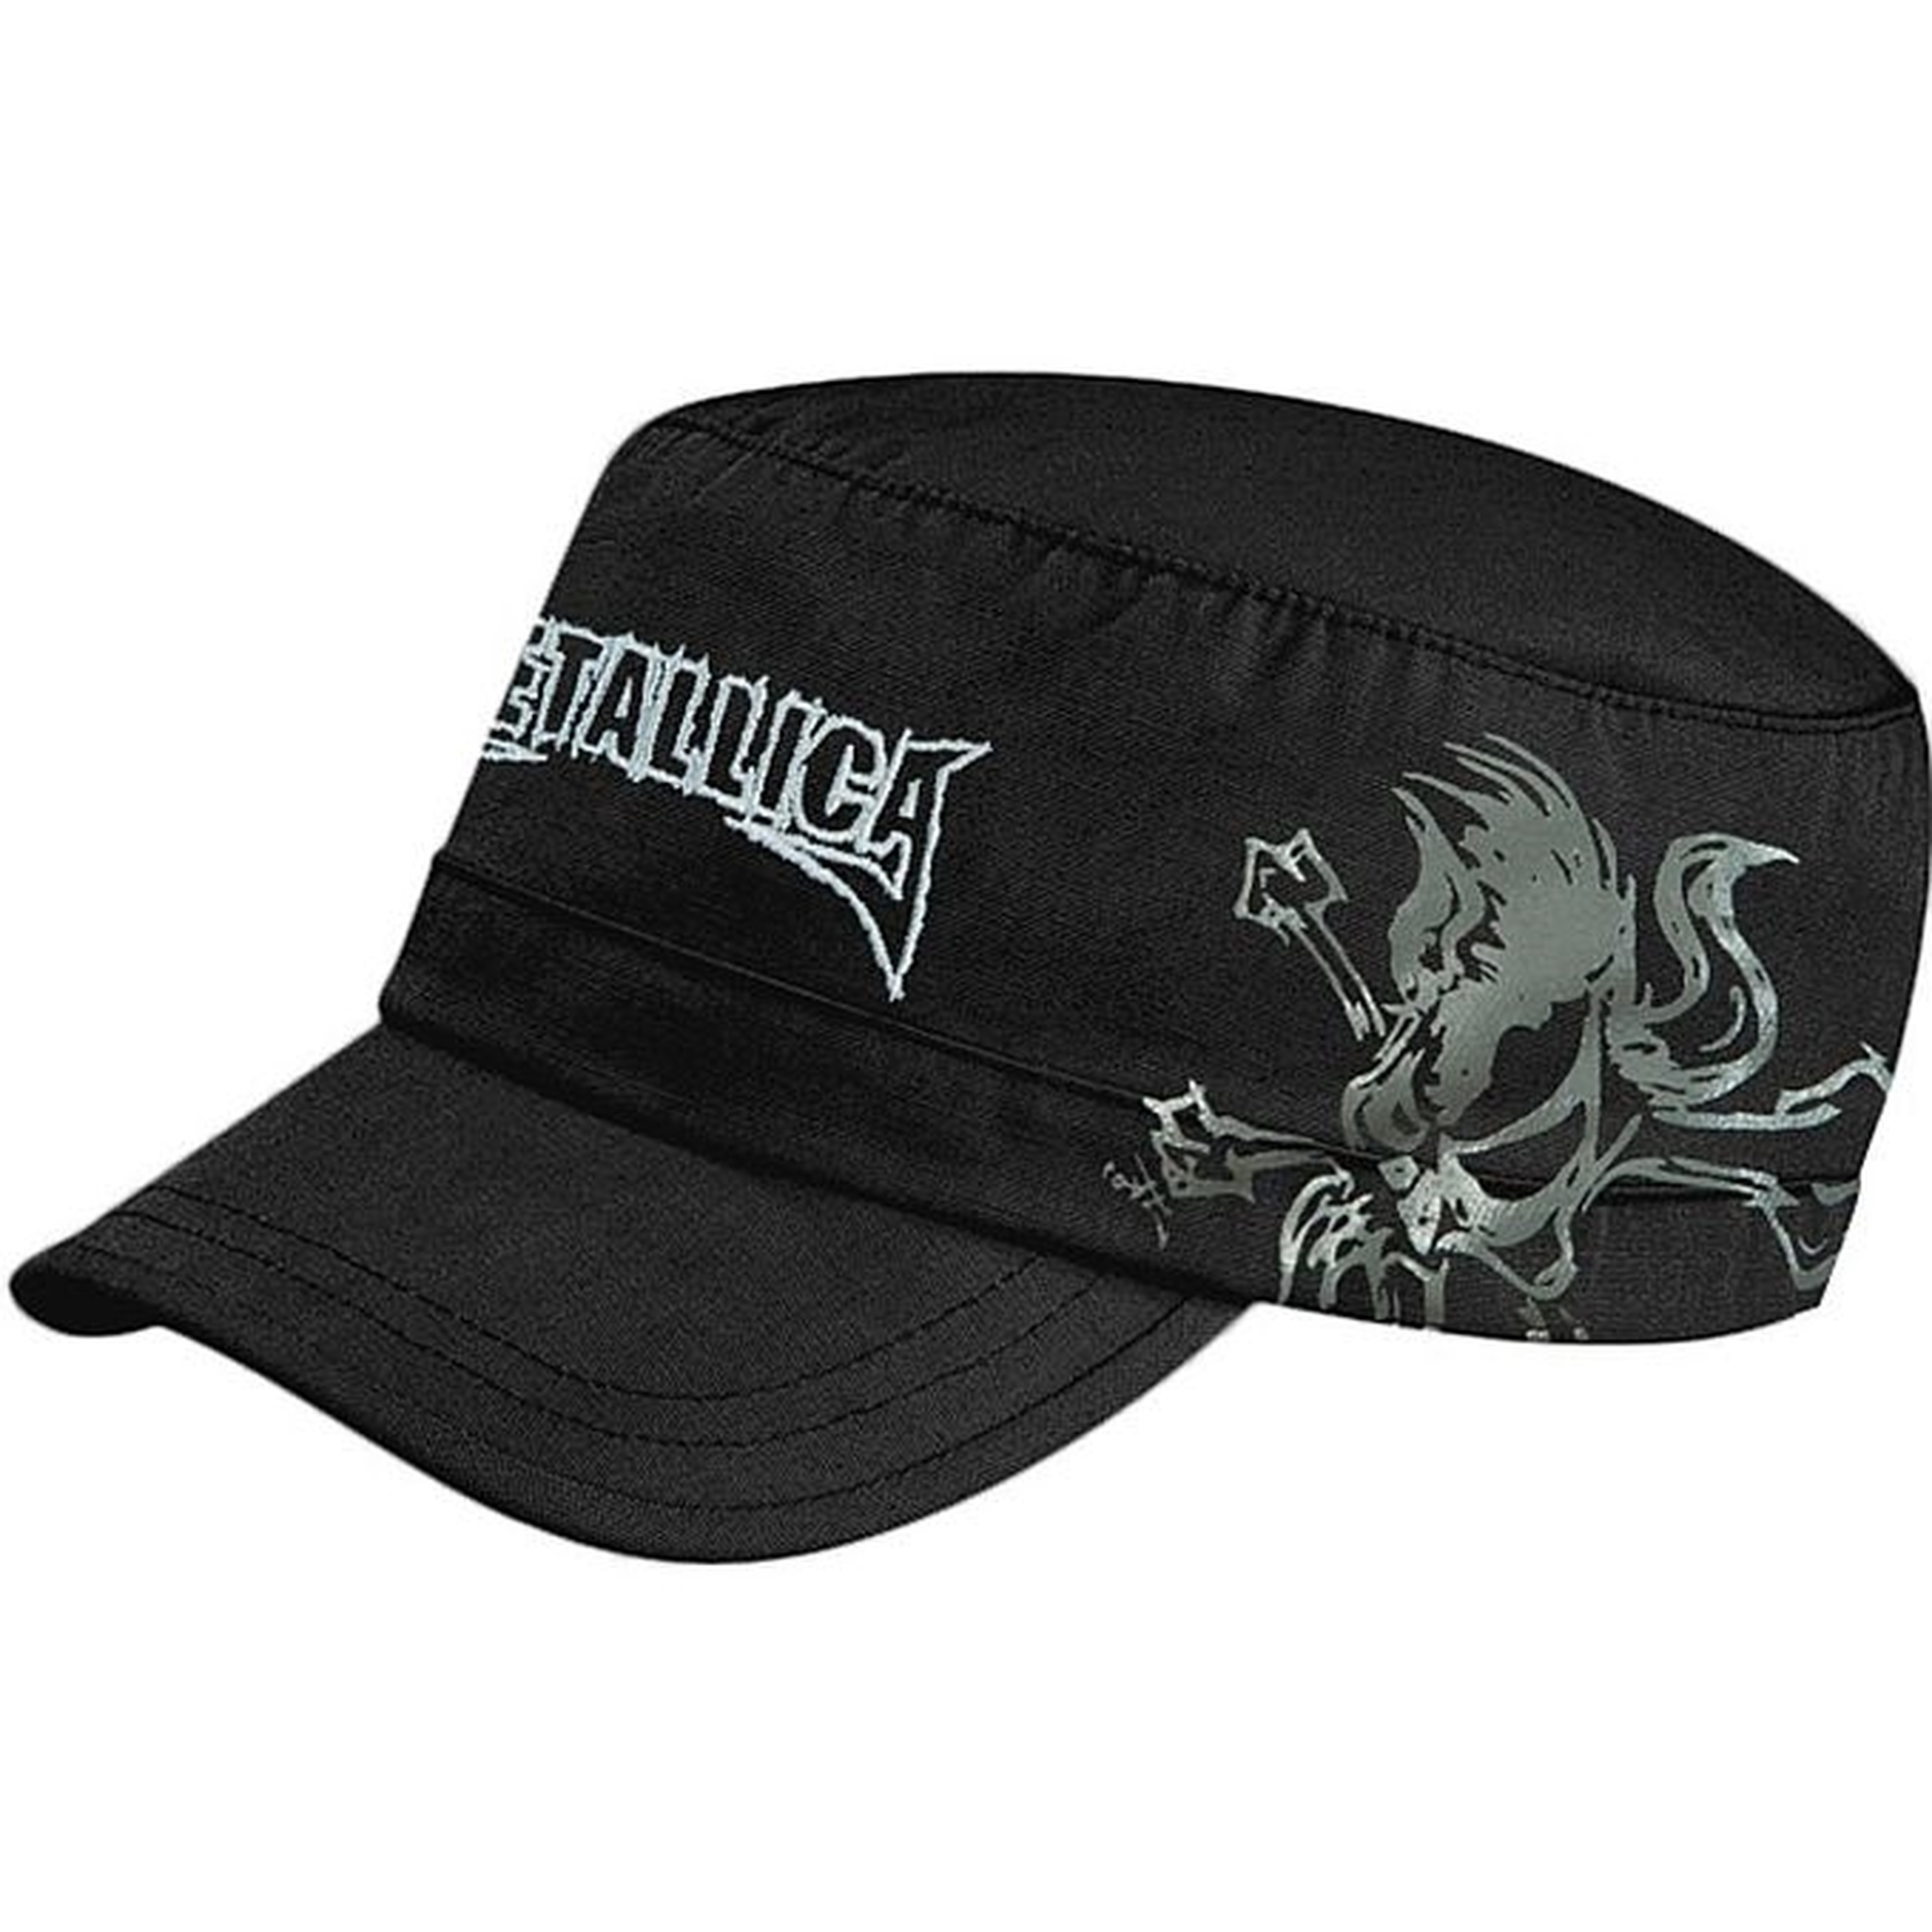 Metallica - Scary Guy Cadet Hat